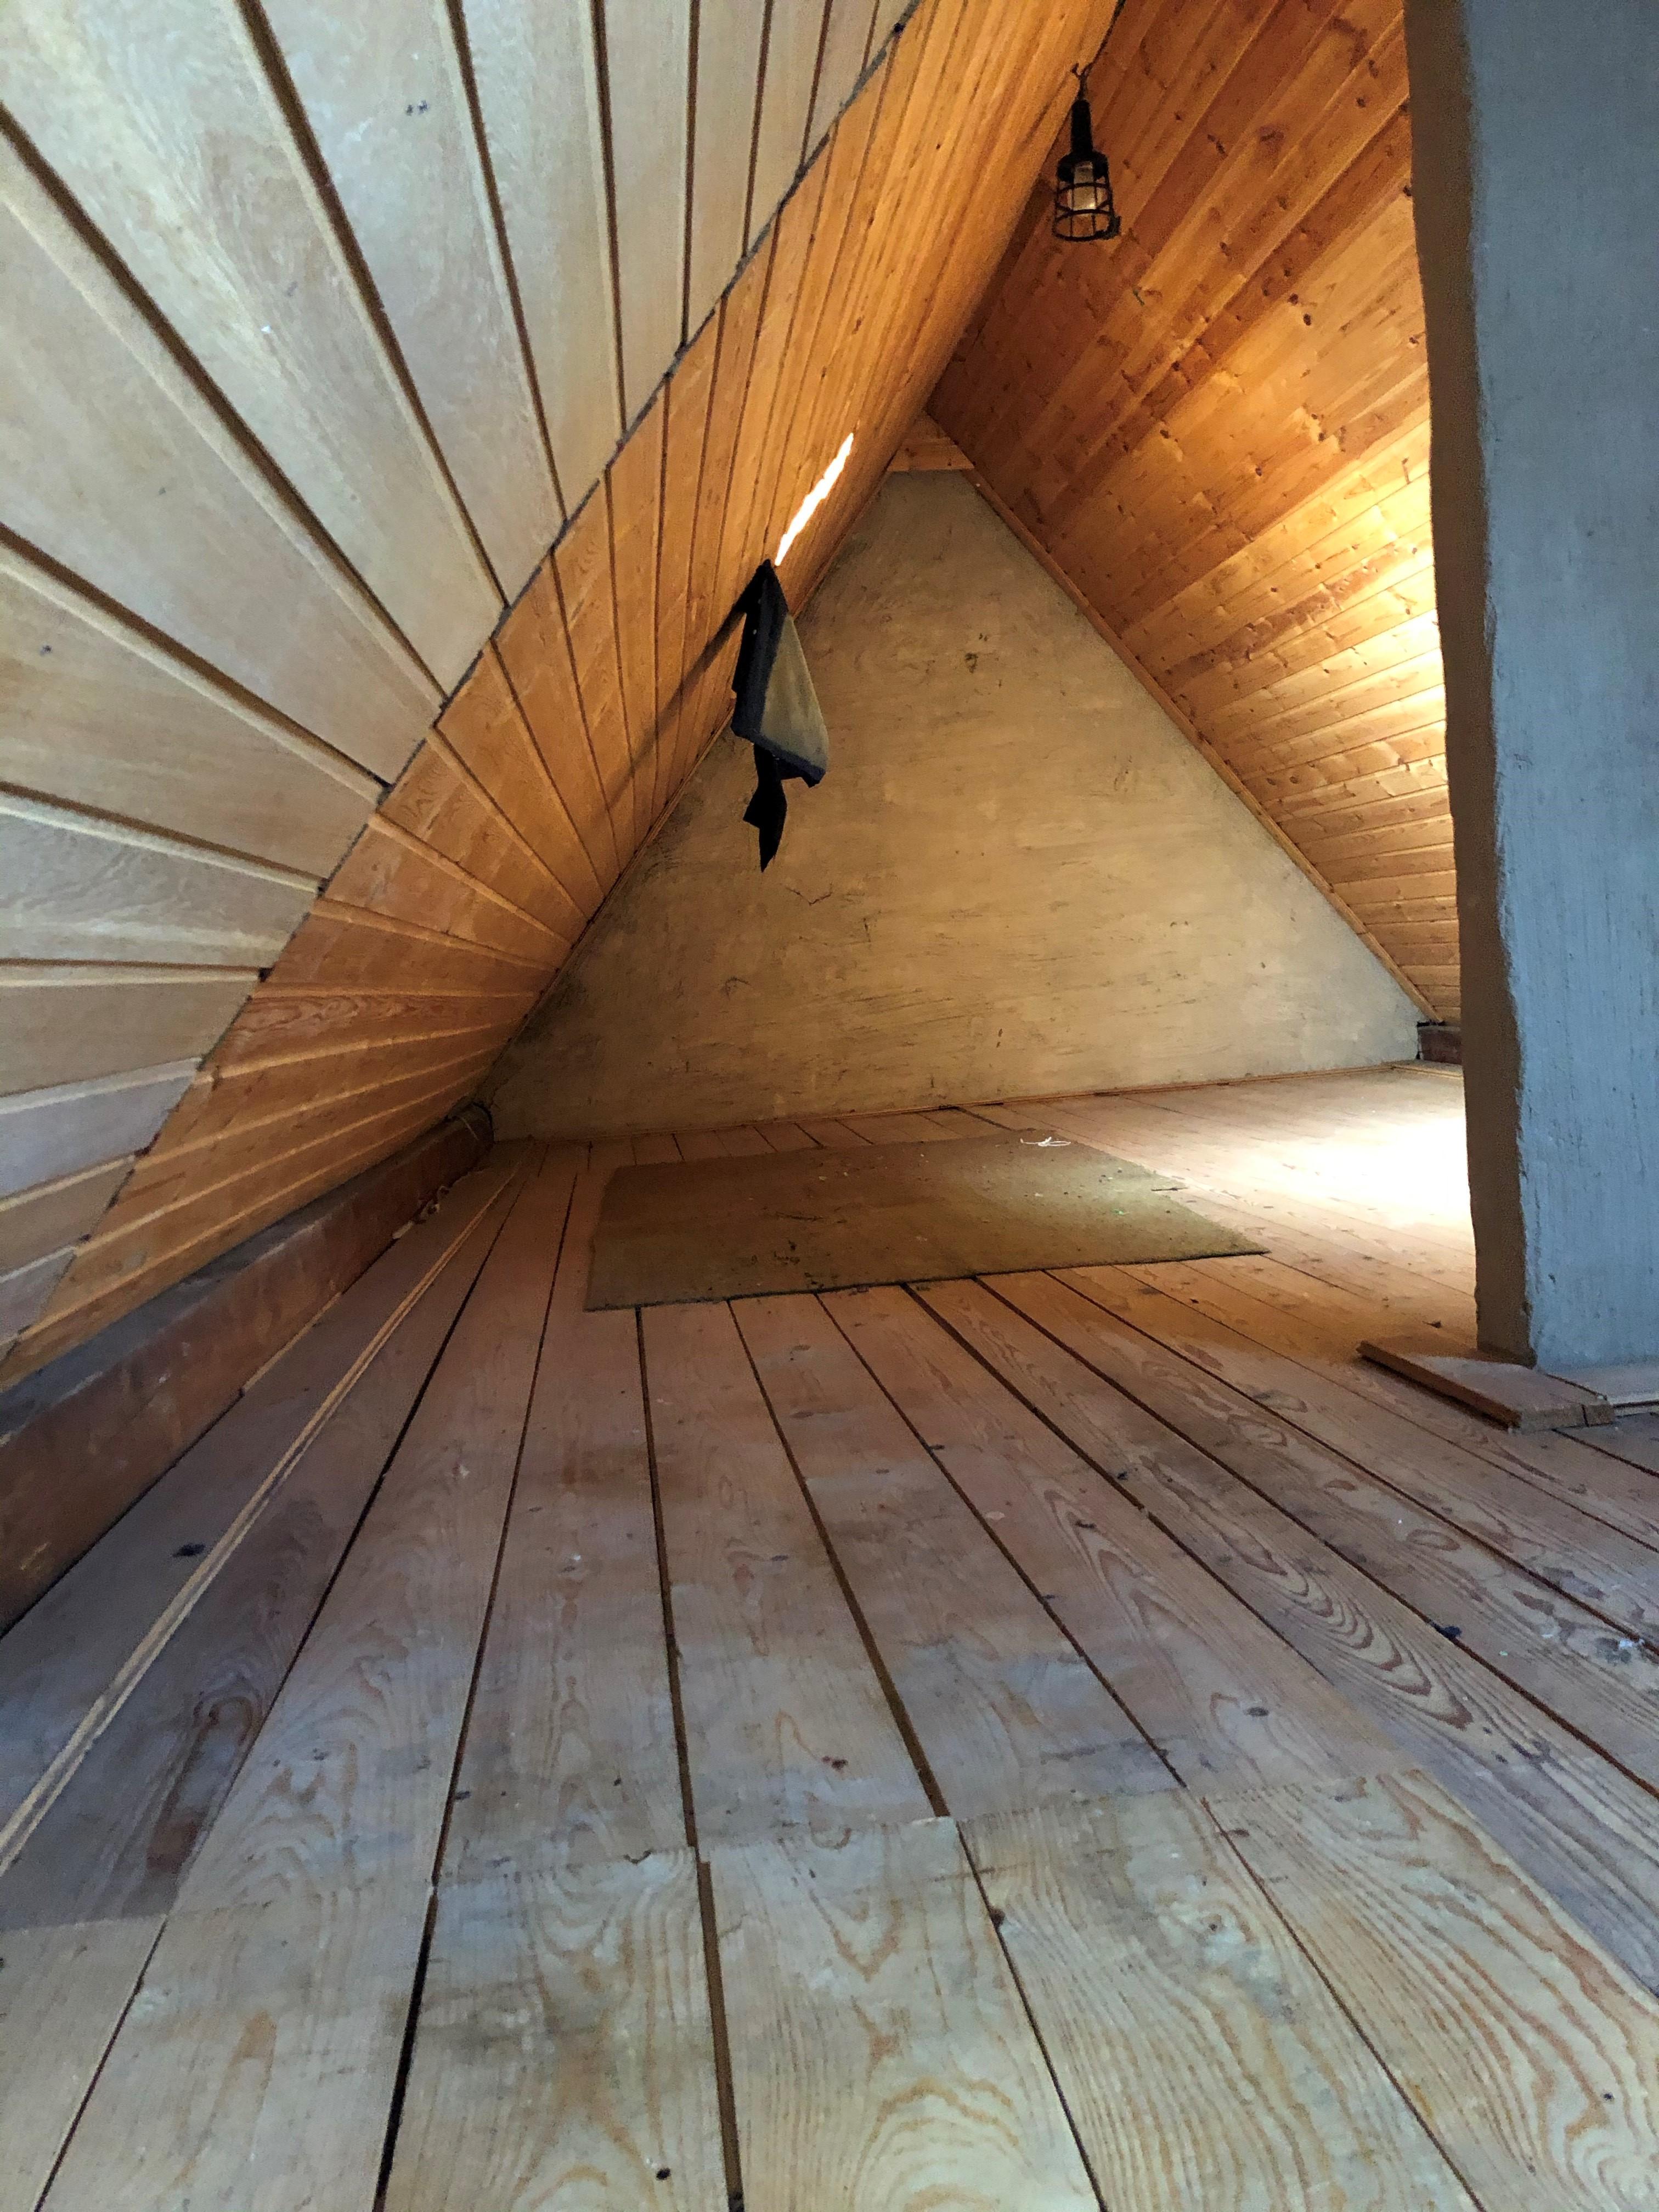 Dachboden - Kopie.jpg